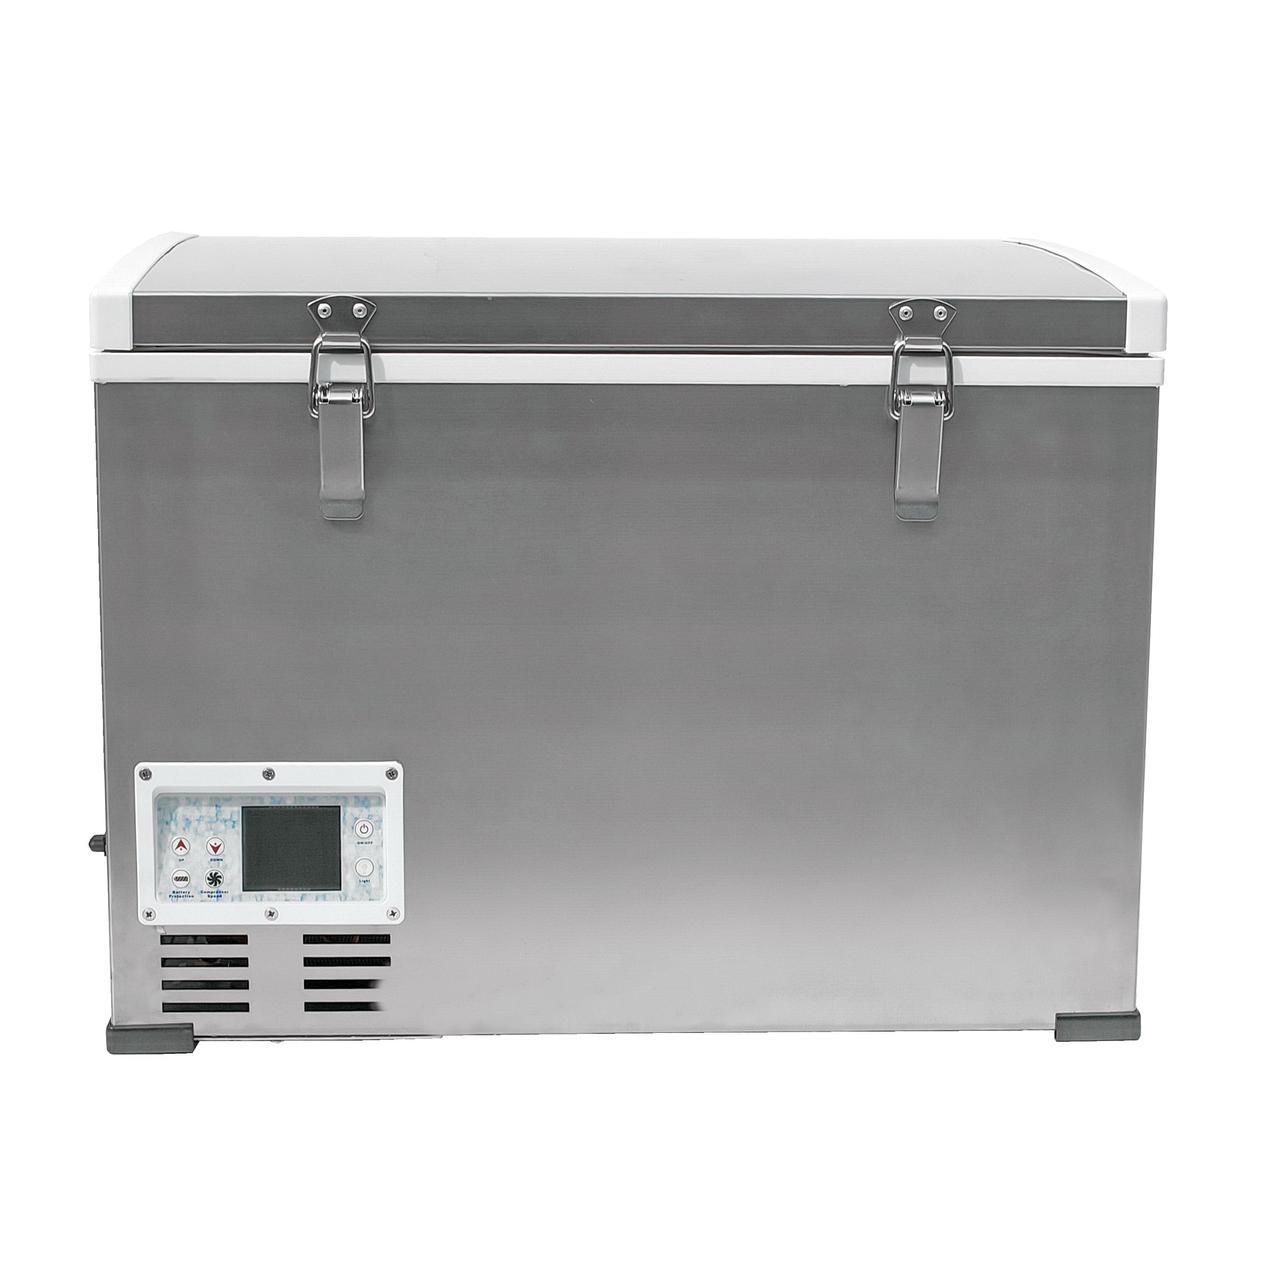 Портативная морозильная камера холодильник Dowell BCD-55